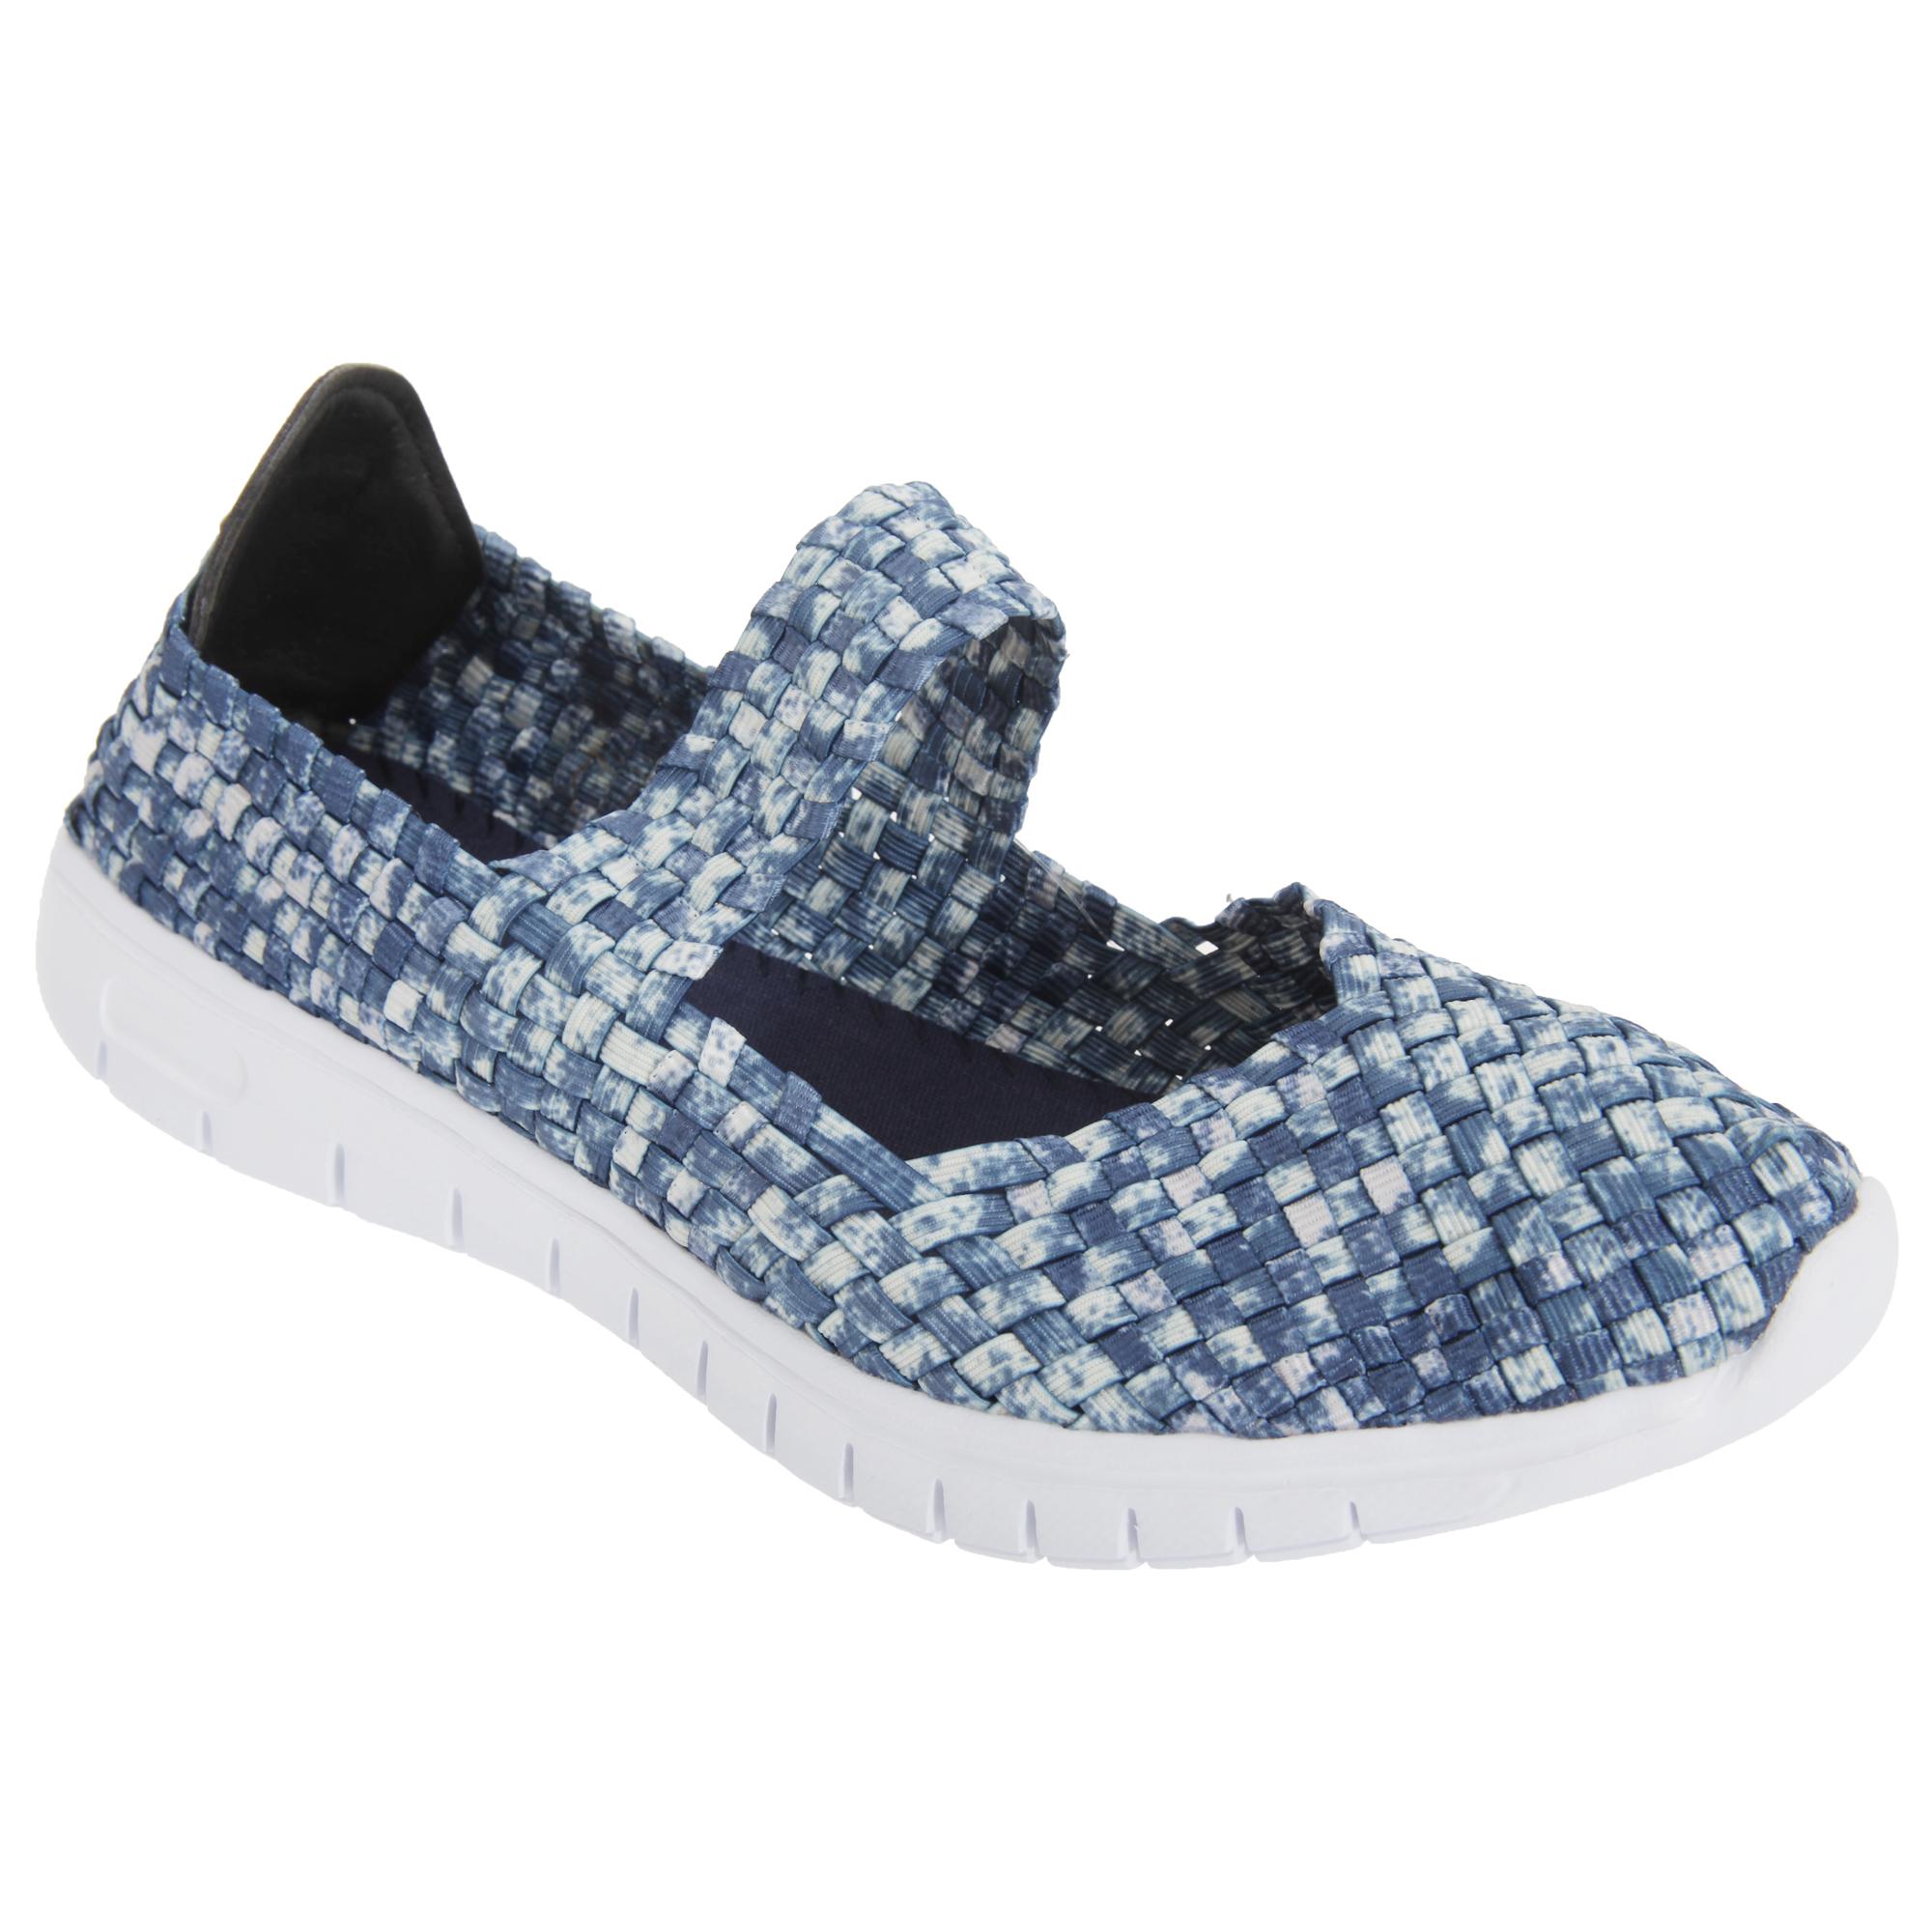 Divaz Belgravia Slip On Shoe / Womens Shoes (FS1619)